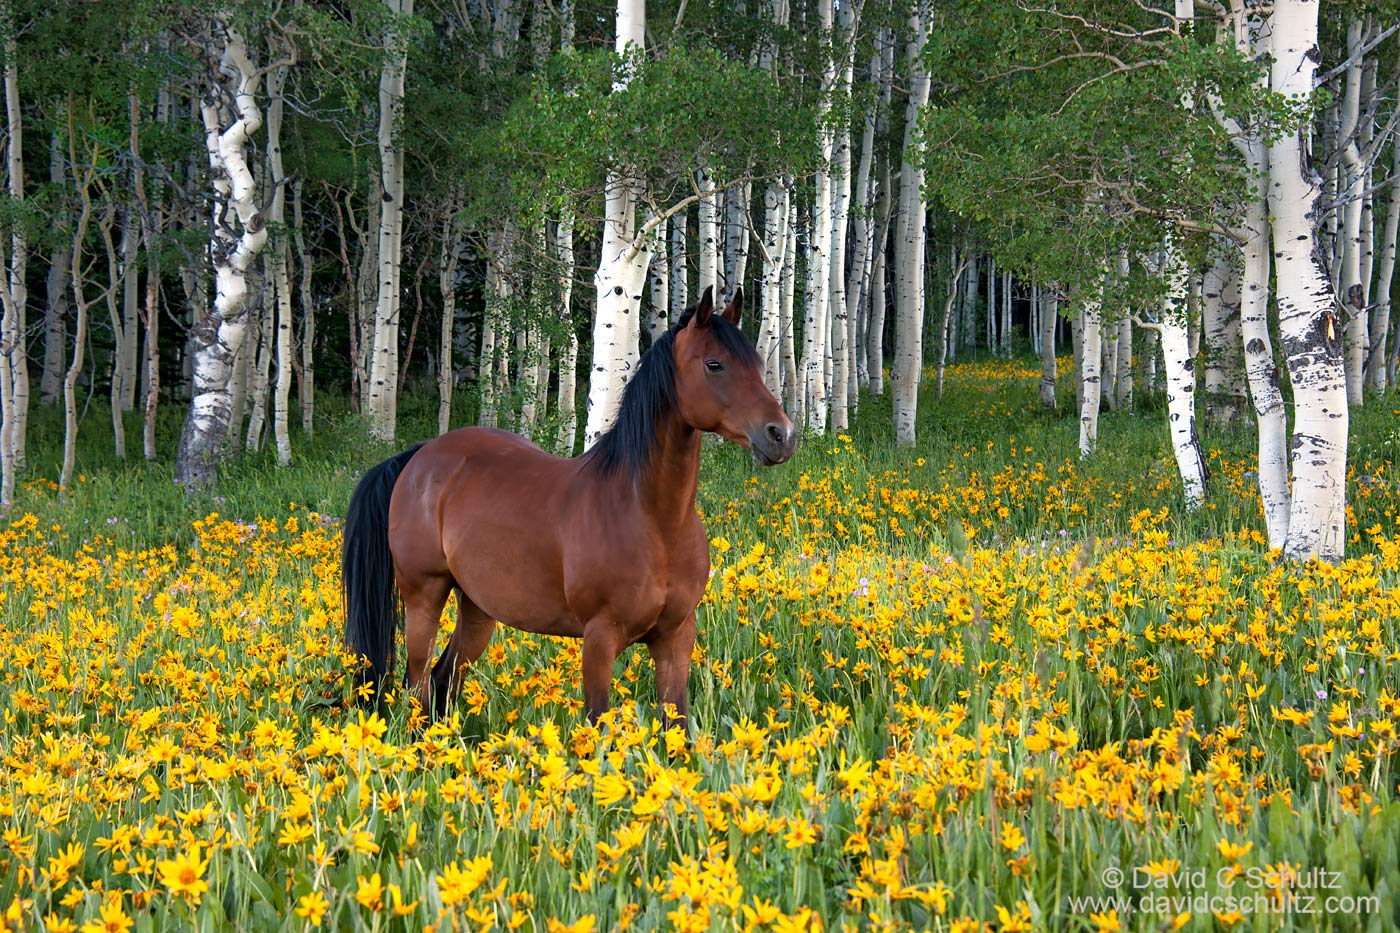 Horse in wildflowers in the Uinta Mountains, Utah - Image #47-881